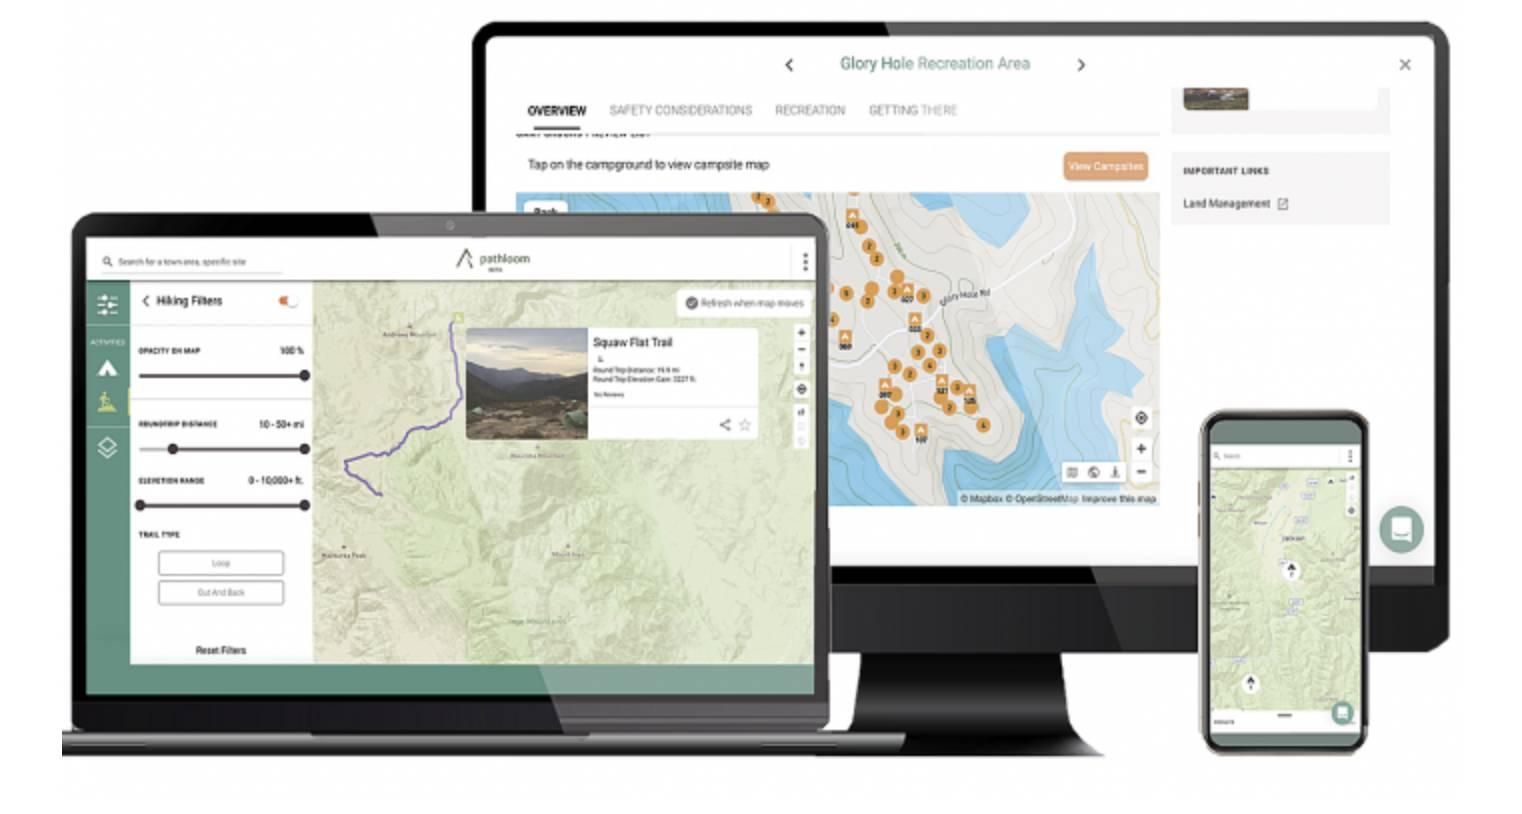 pathloom app maps on laptop, desktop, and mobile screens